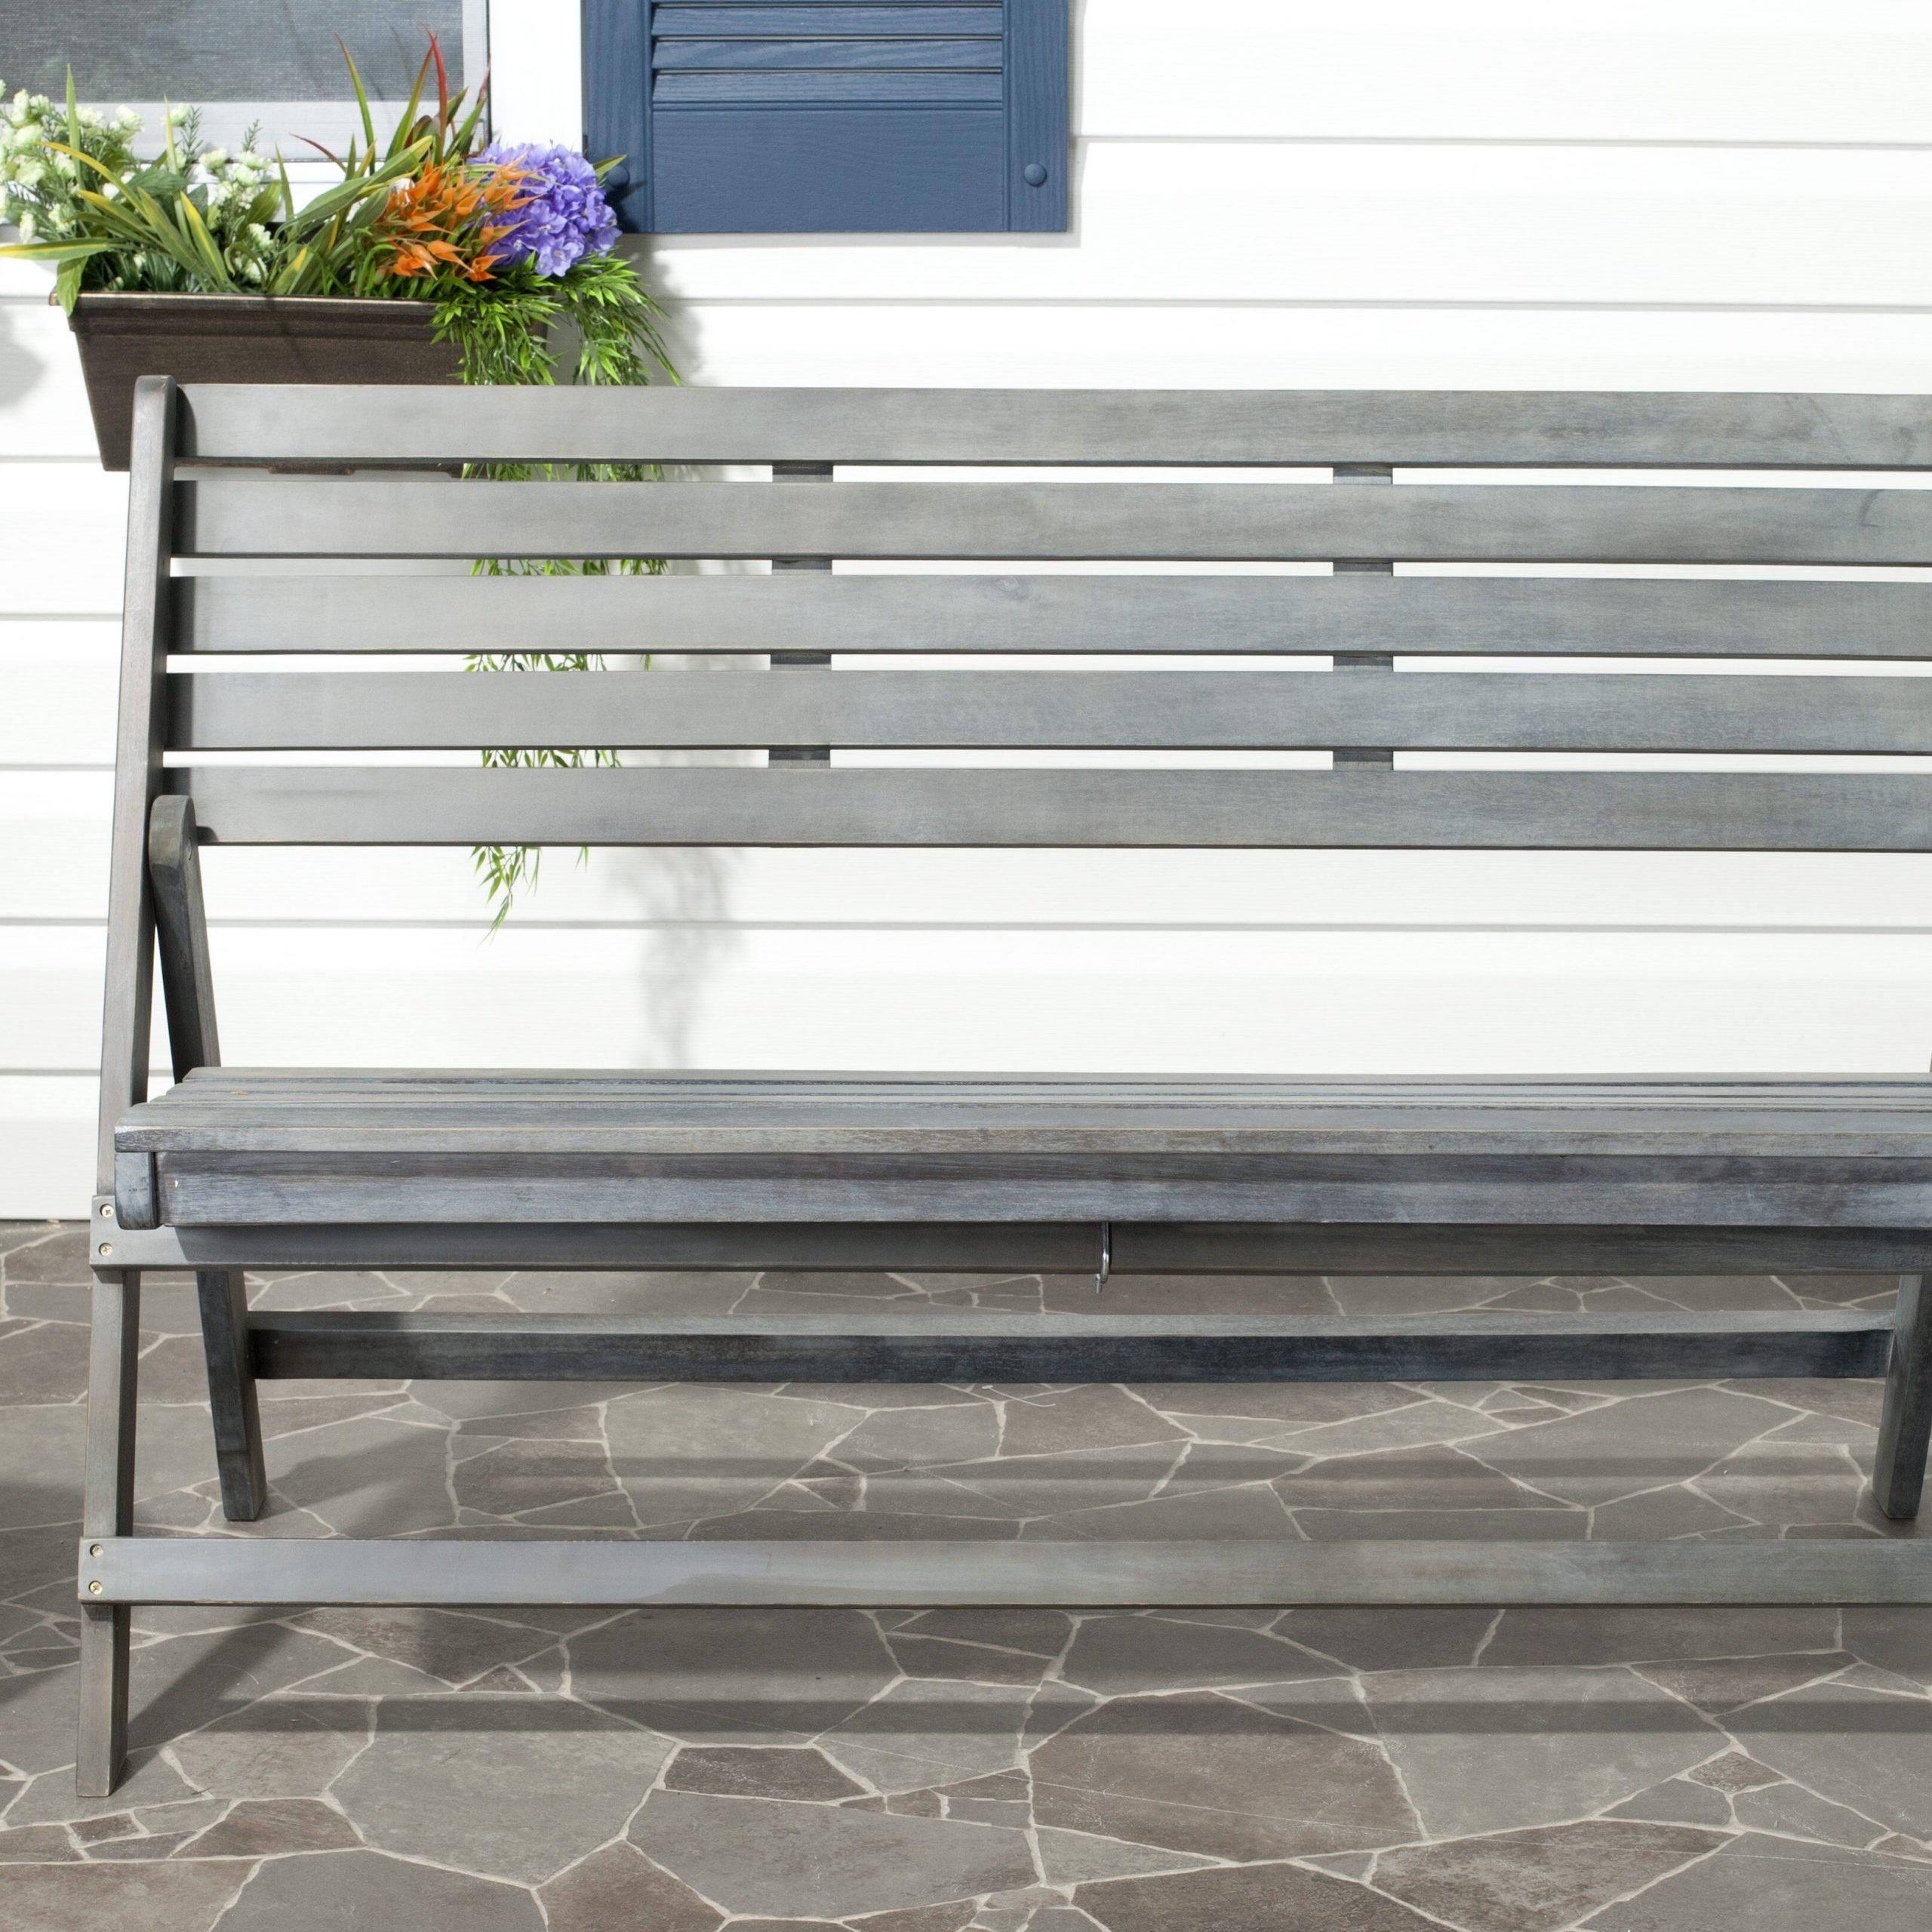 Mignardise Wooden Garden Bench Pertaining To Cavin Garden Benches (View 12 of 25)